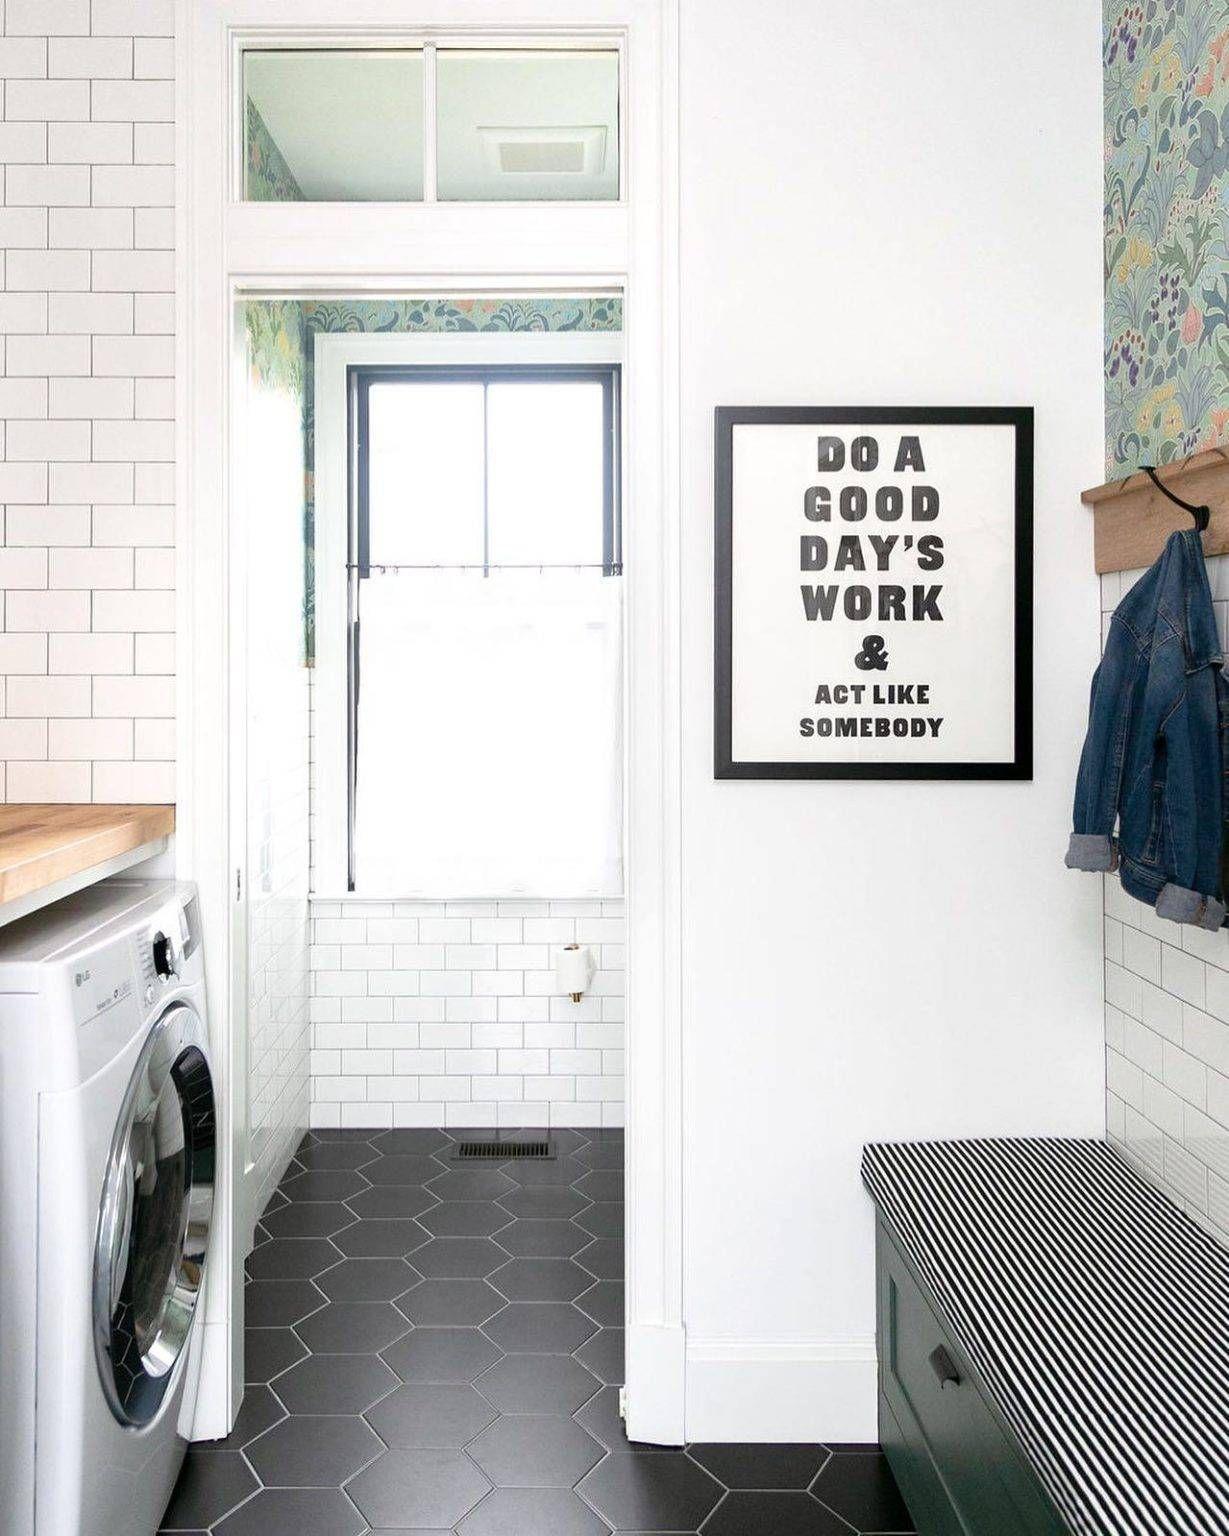 16 Tiled Laundry Rooms We Love The Tile Shop Blog In 2021 Laundry Room Tile Laundry Room Flooring Laundry Room Inspiration Laundry room floor ideas